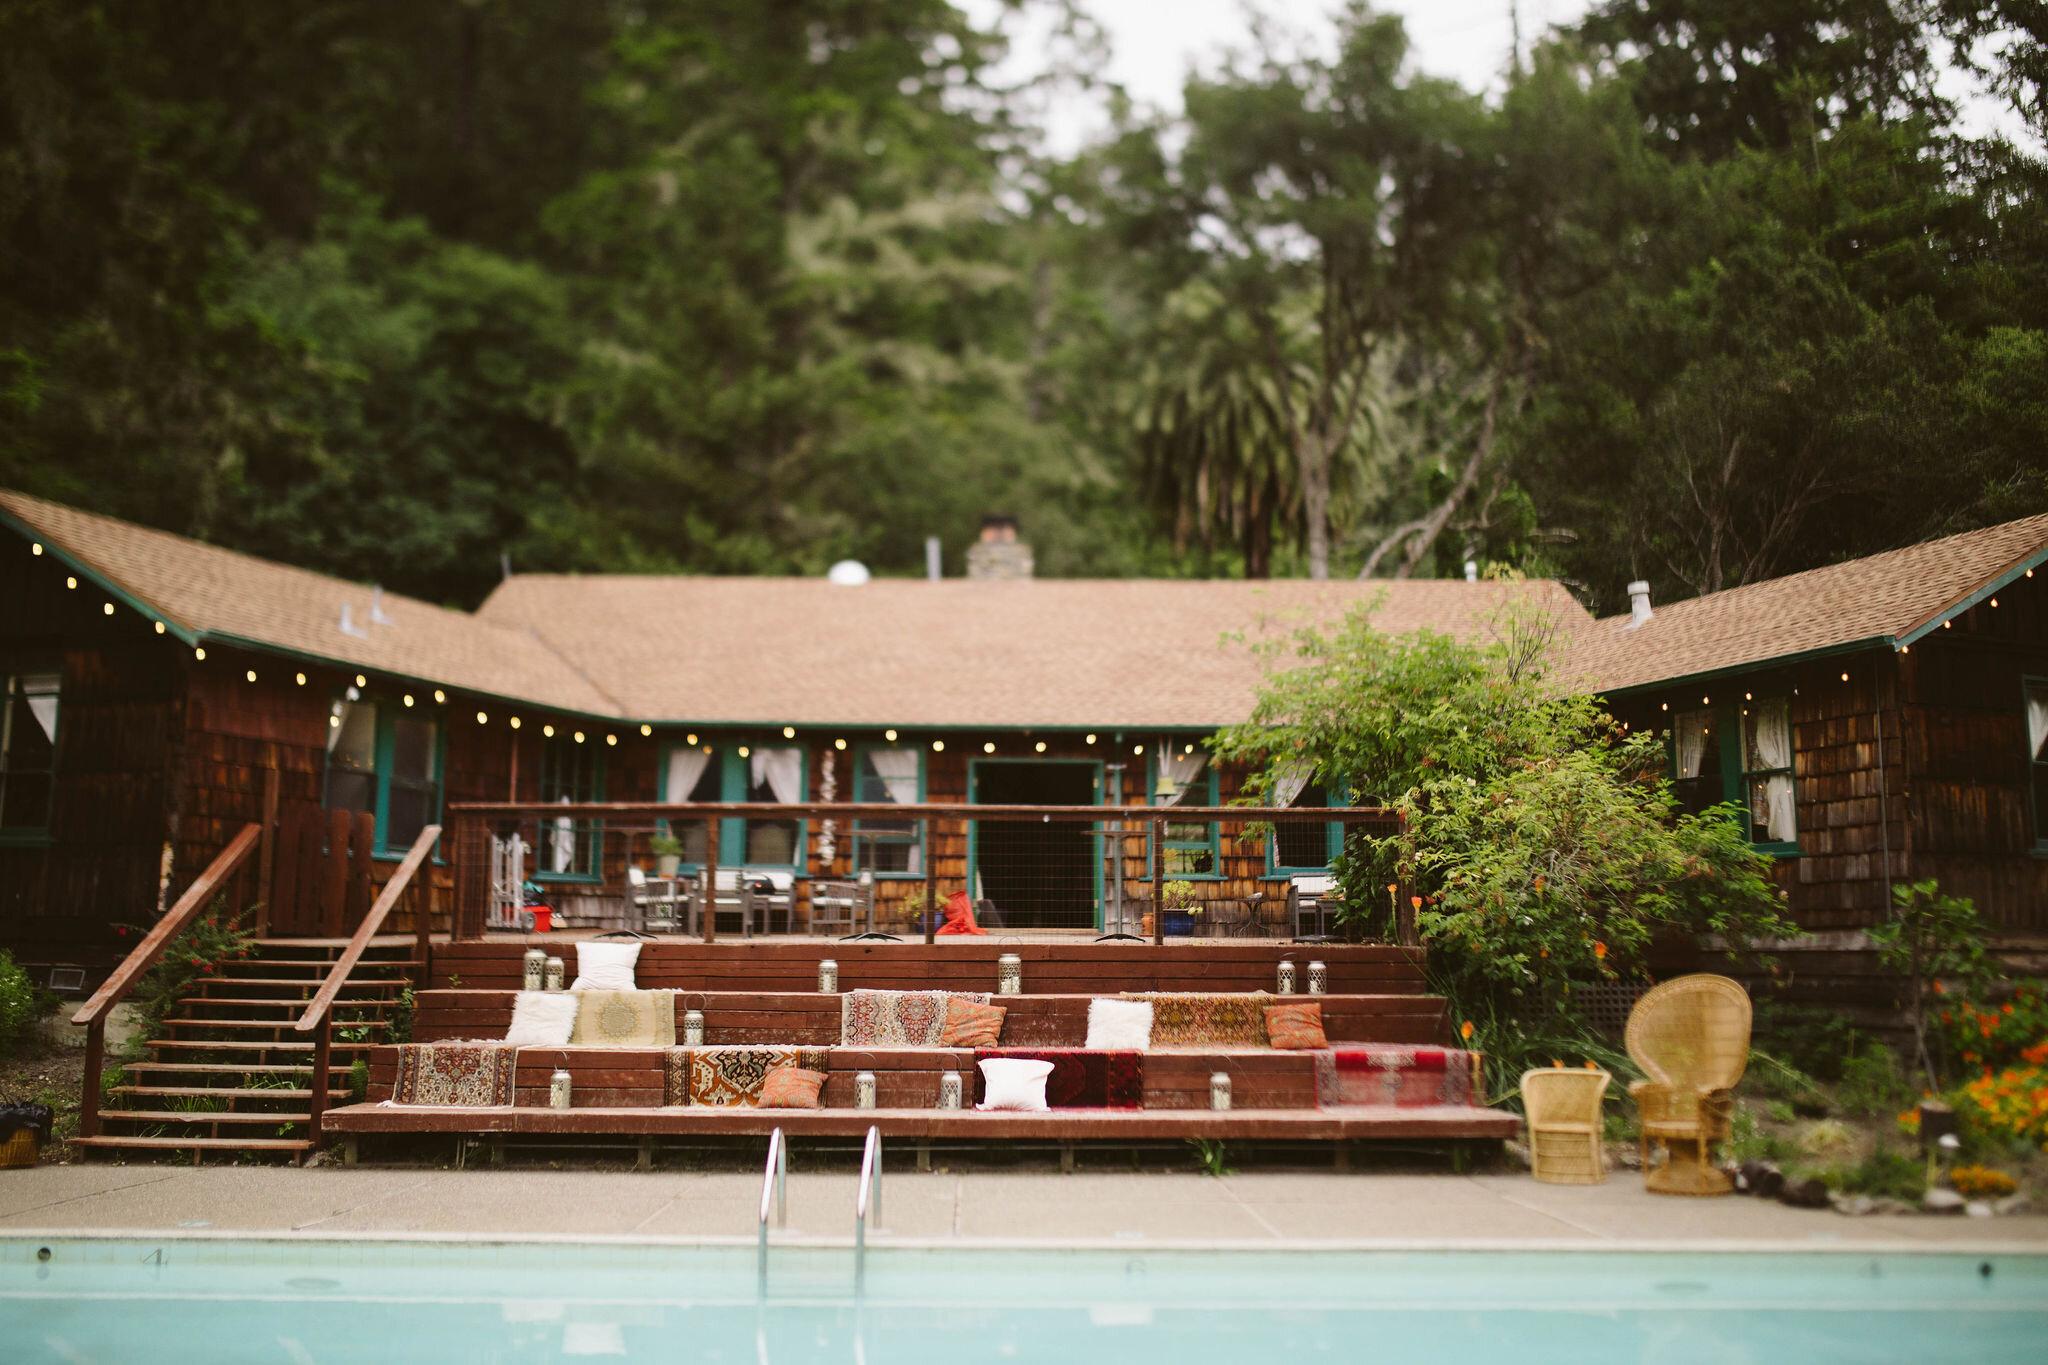 Venture-Retreat-Center-Wedding-Pescadero-Fri-Aaron-Pritam-The-Shalom-Imaginative-11.jpg